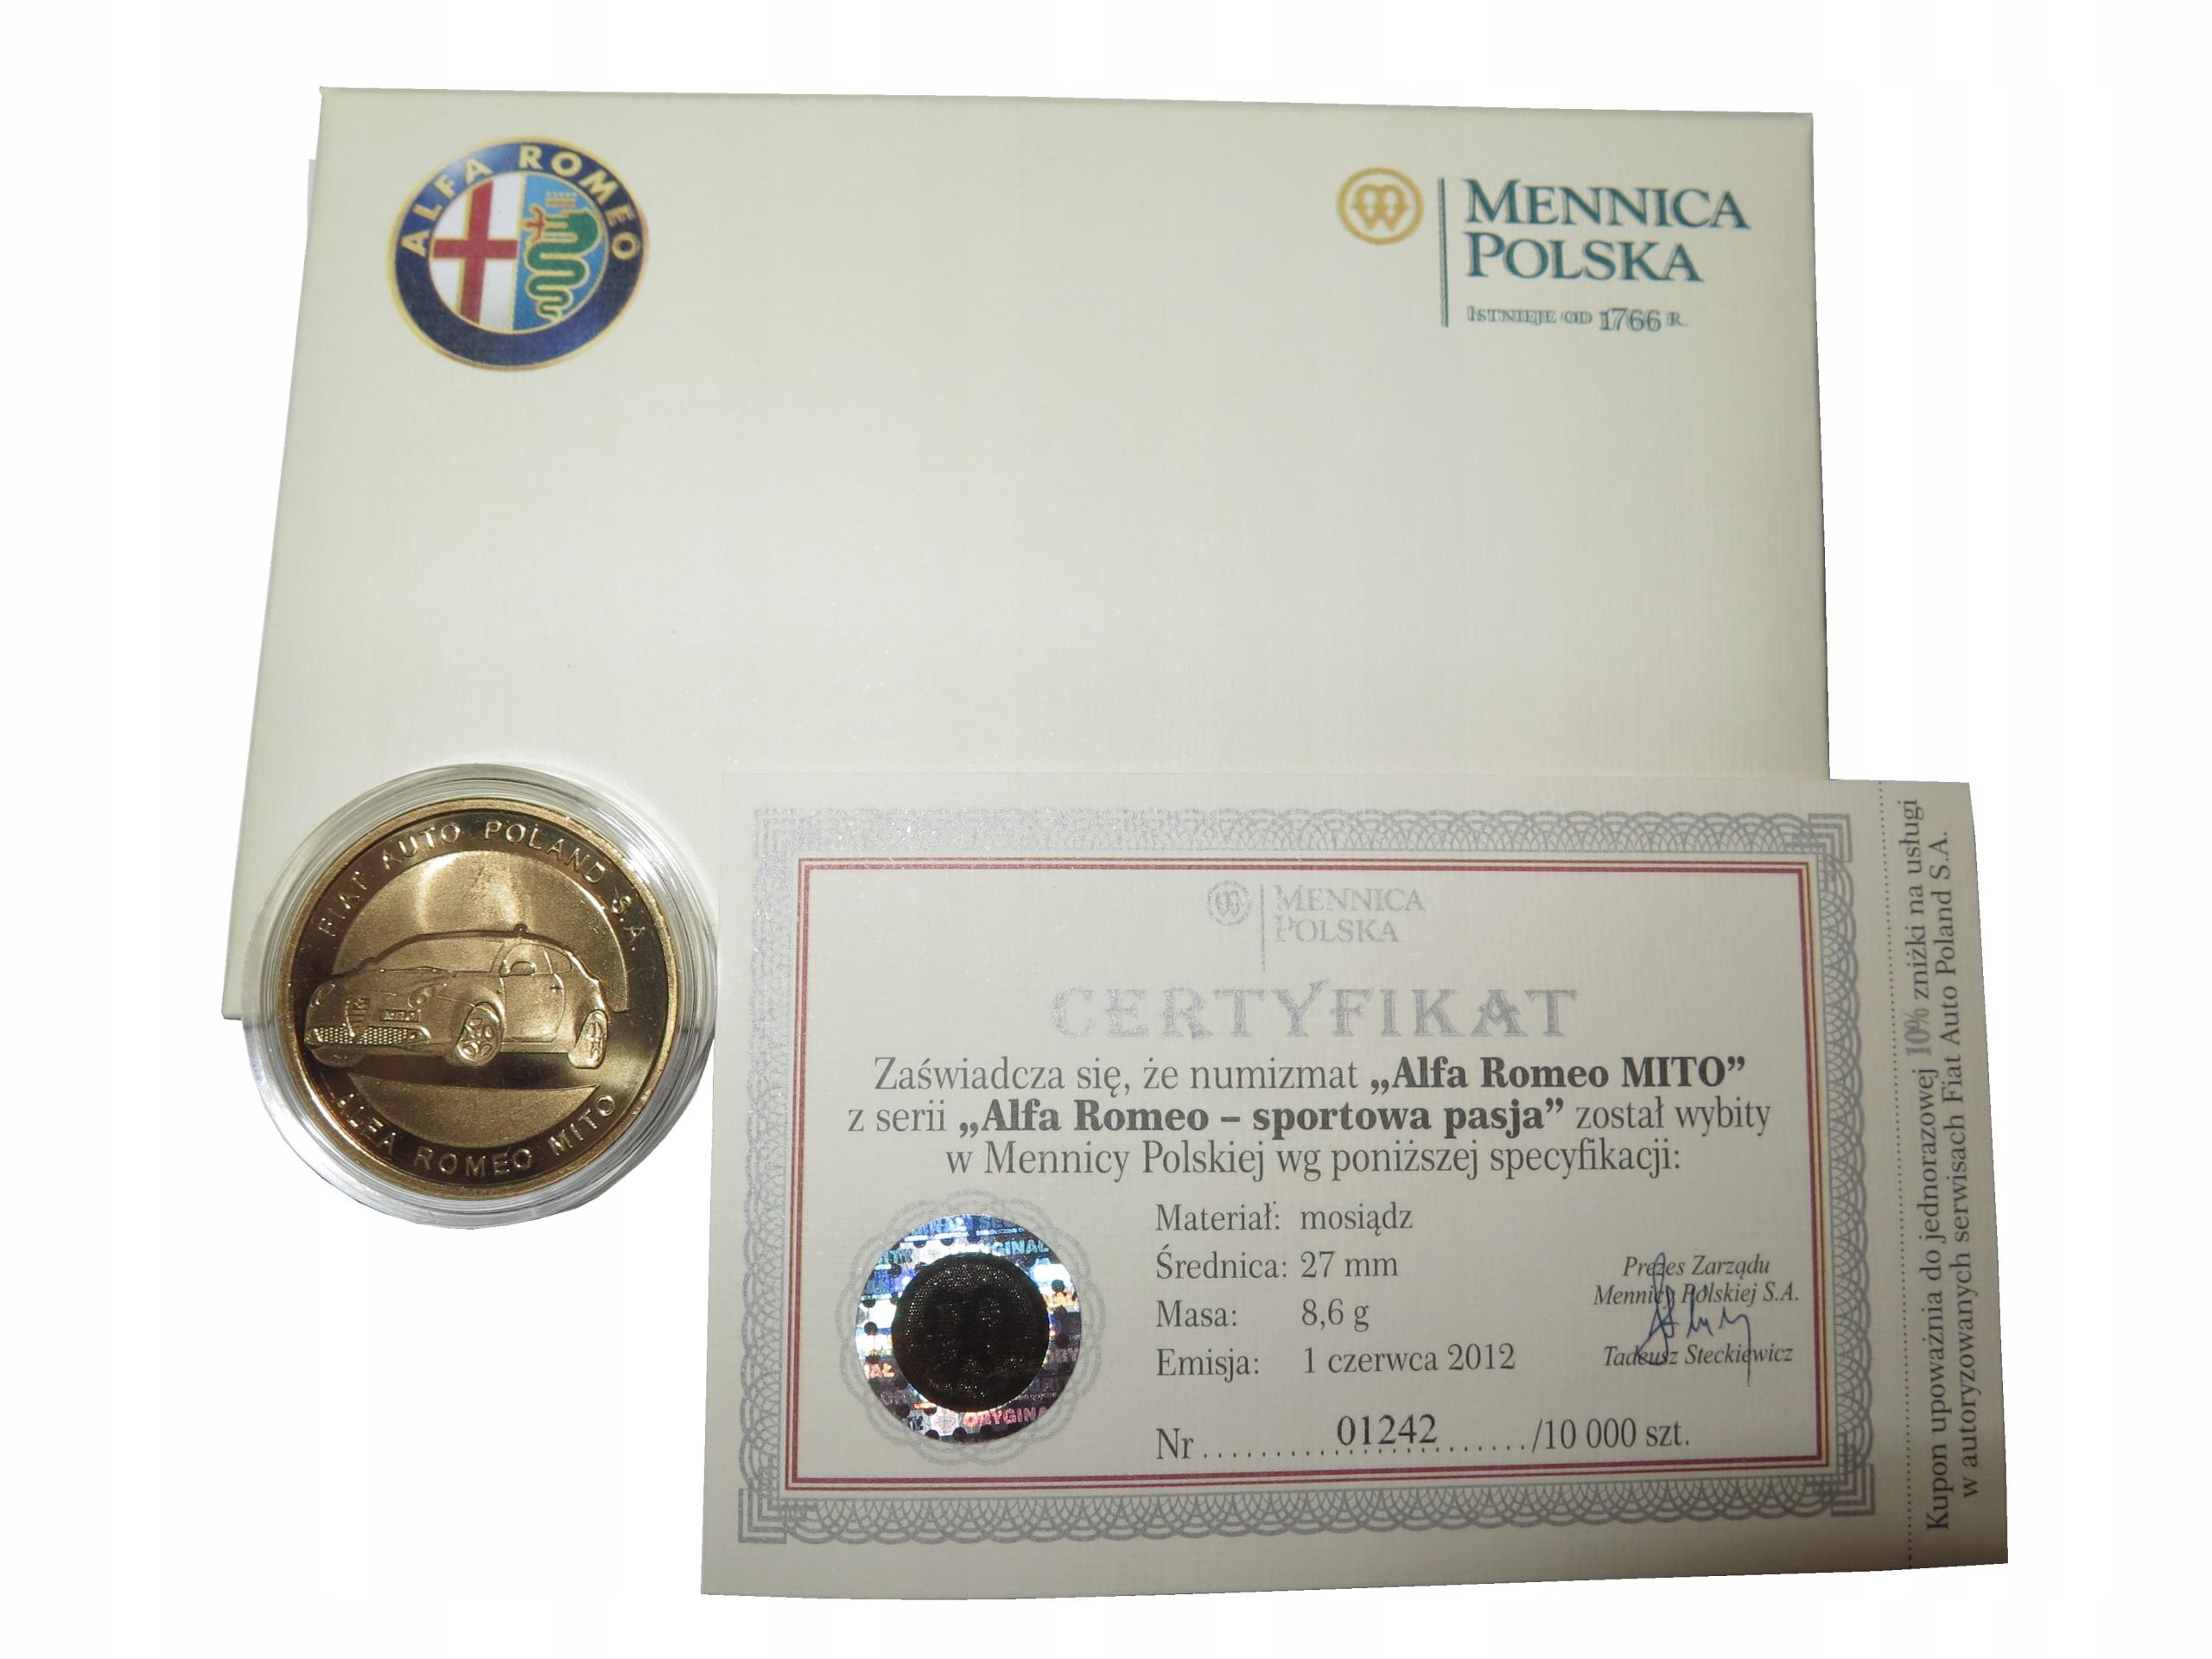 Numizmat moneta kolekcjonersk ALFA ROMEO MITO